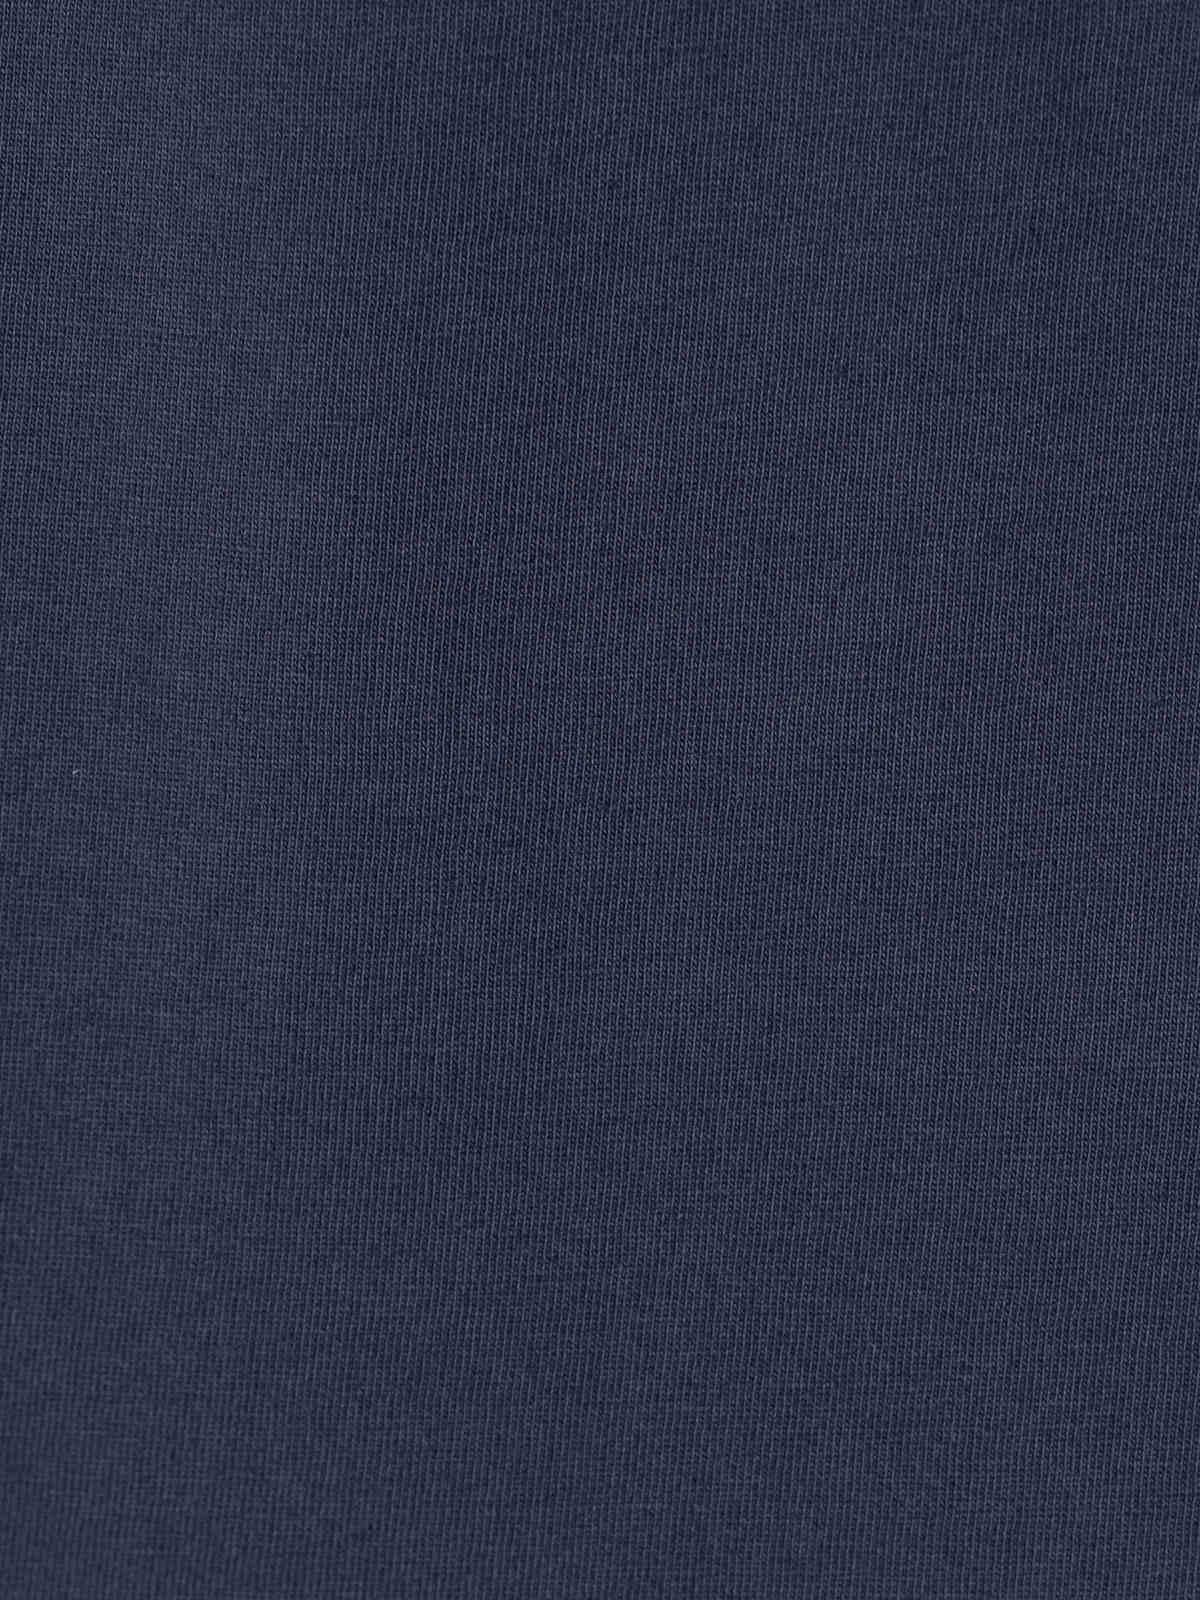 Camiseta mujer lisa algodón Azul Marino